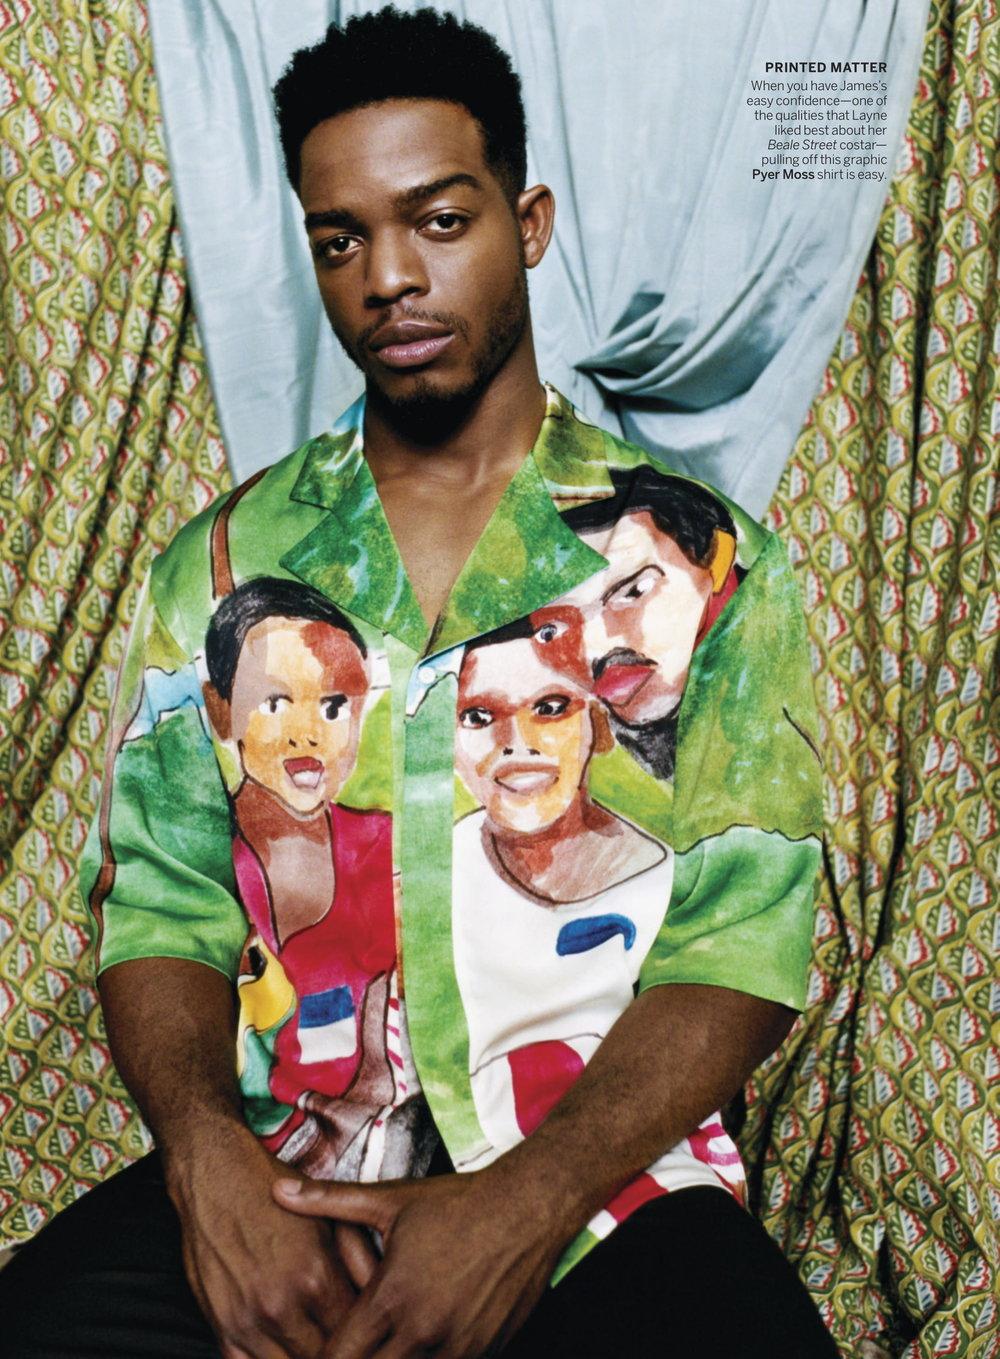 Kiki Layne, Stephan James by Tyler Mitchell for Vogue US Jan 2019 (2).jpg